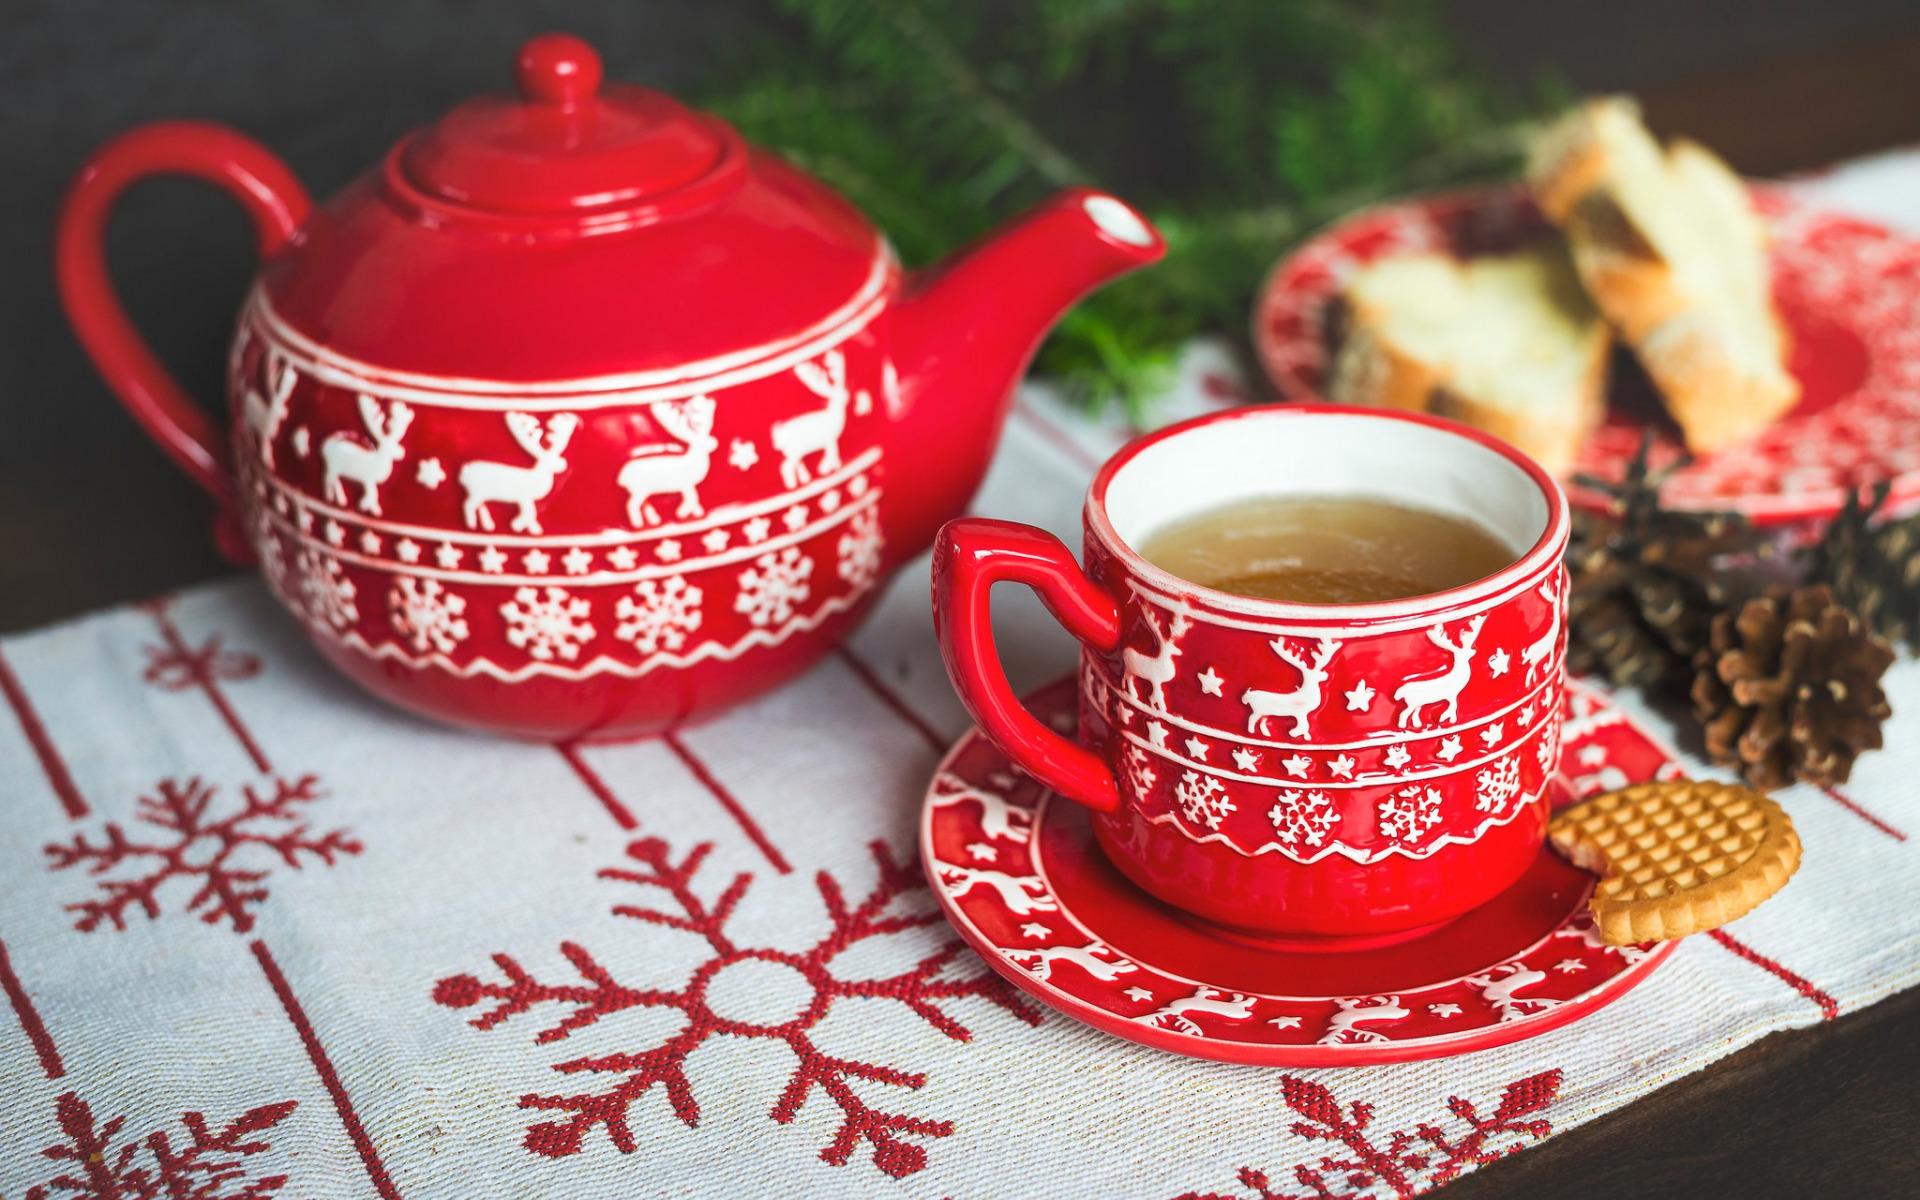 приводит картинки новогоднее чаепитие техники